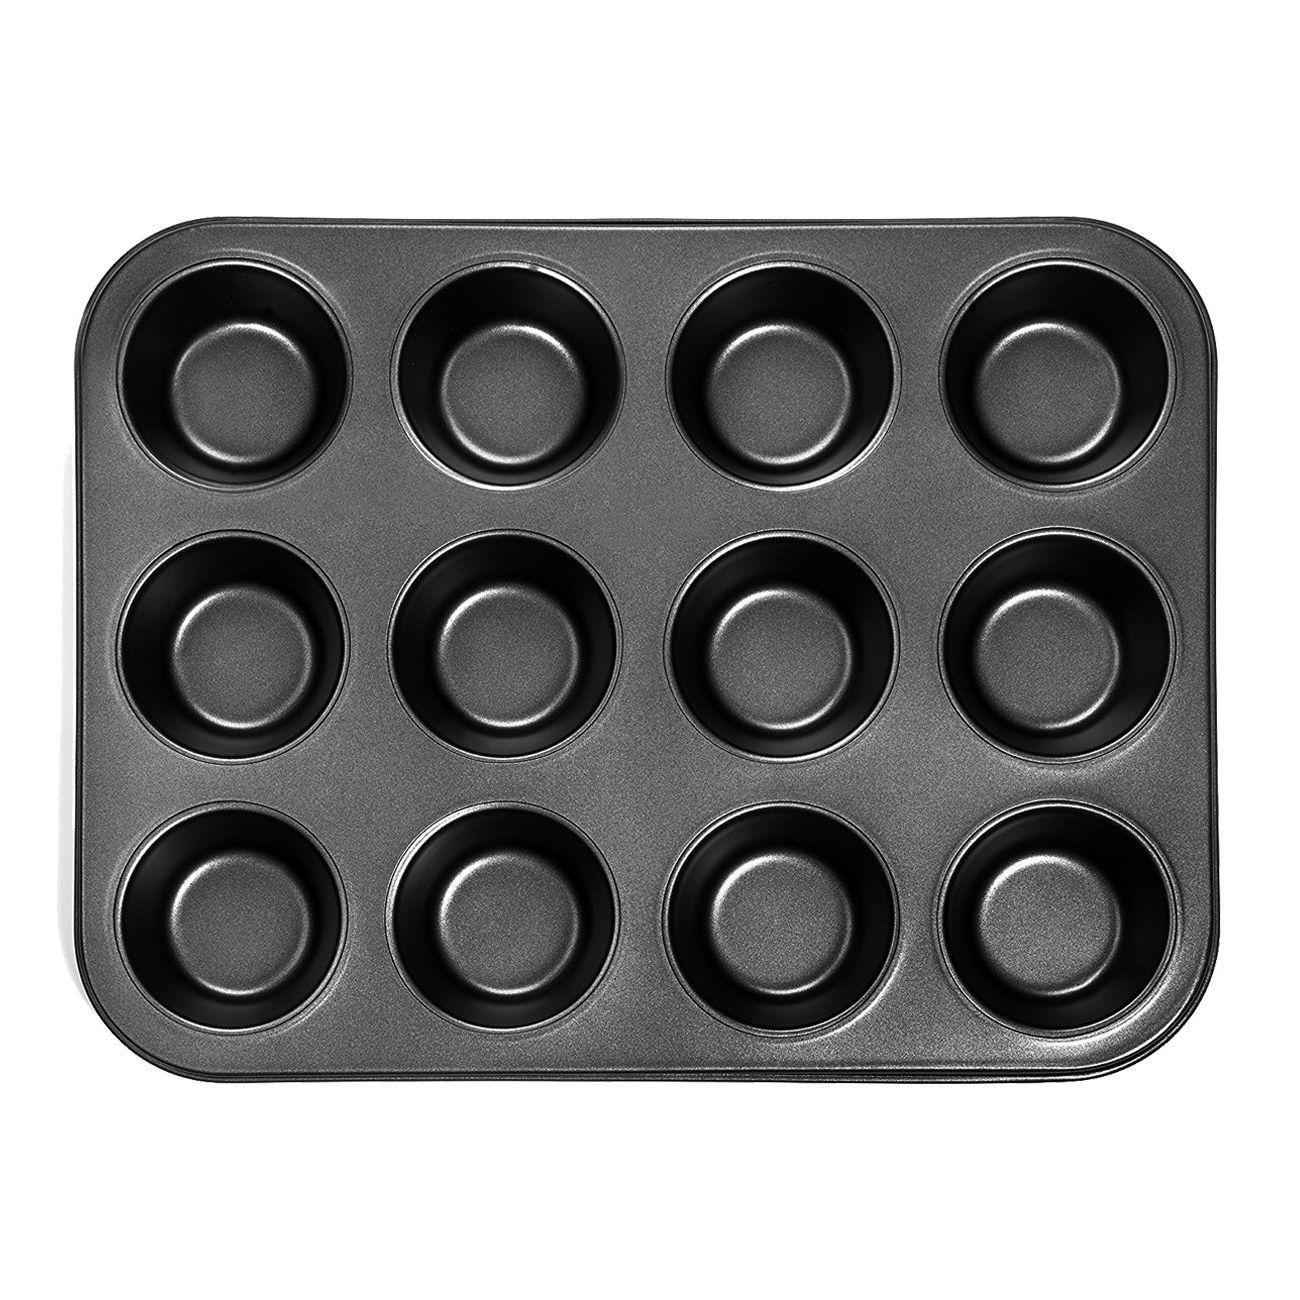 Heißer Verkauf Heavy duty carbon stahl cupcake backblech, 12 mini tasse cupcake förmigen kuchen pan, nonstick cupcake backblech, cupcake